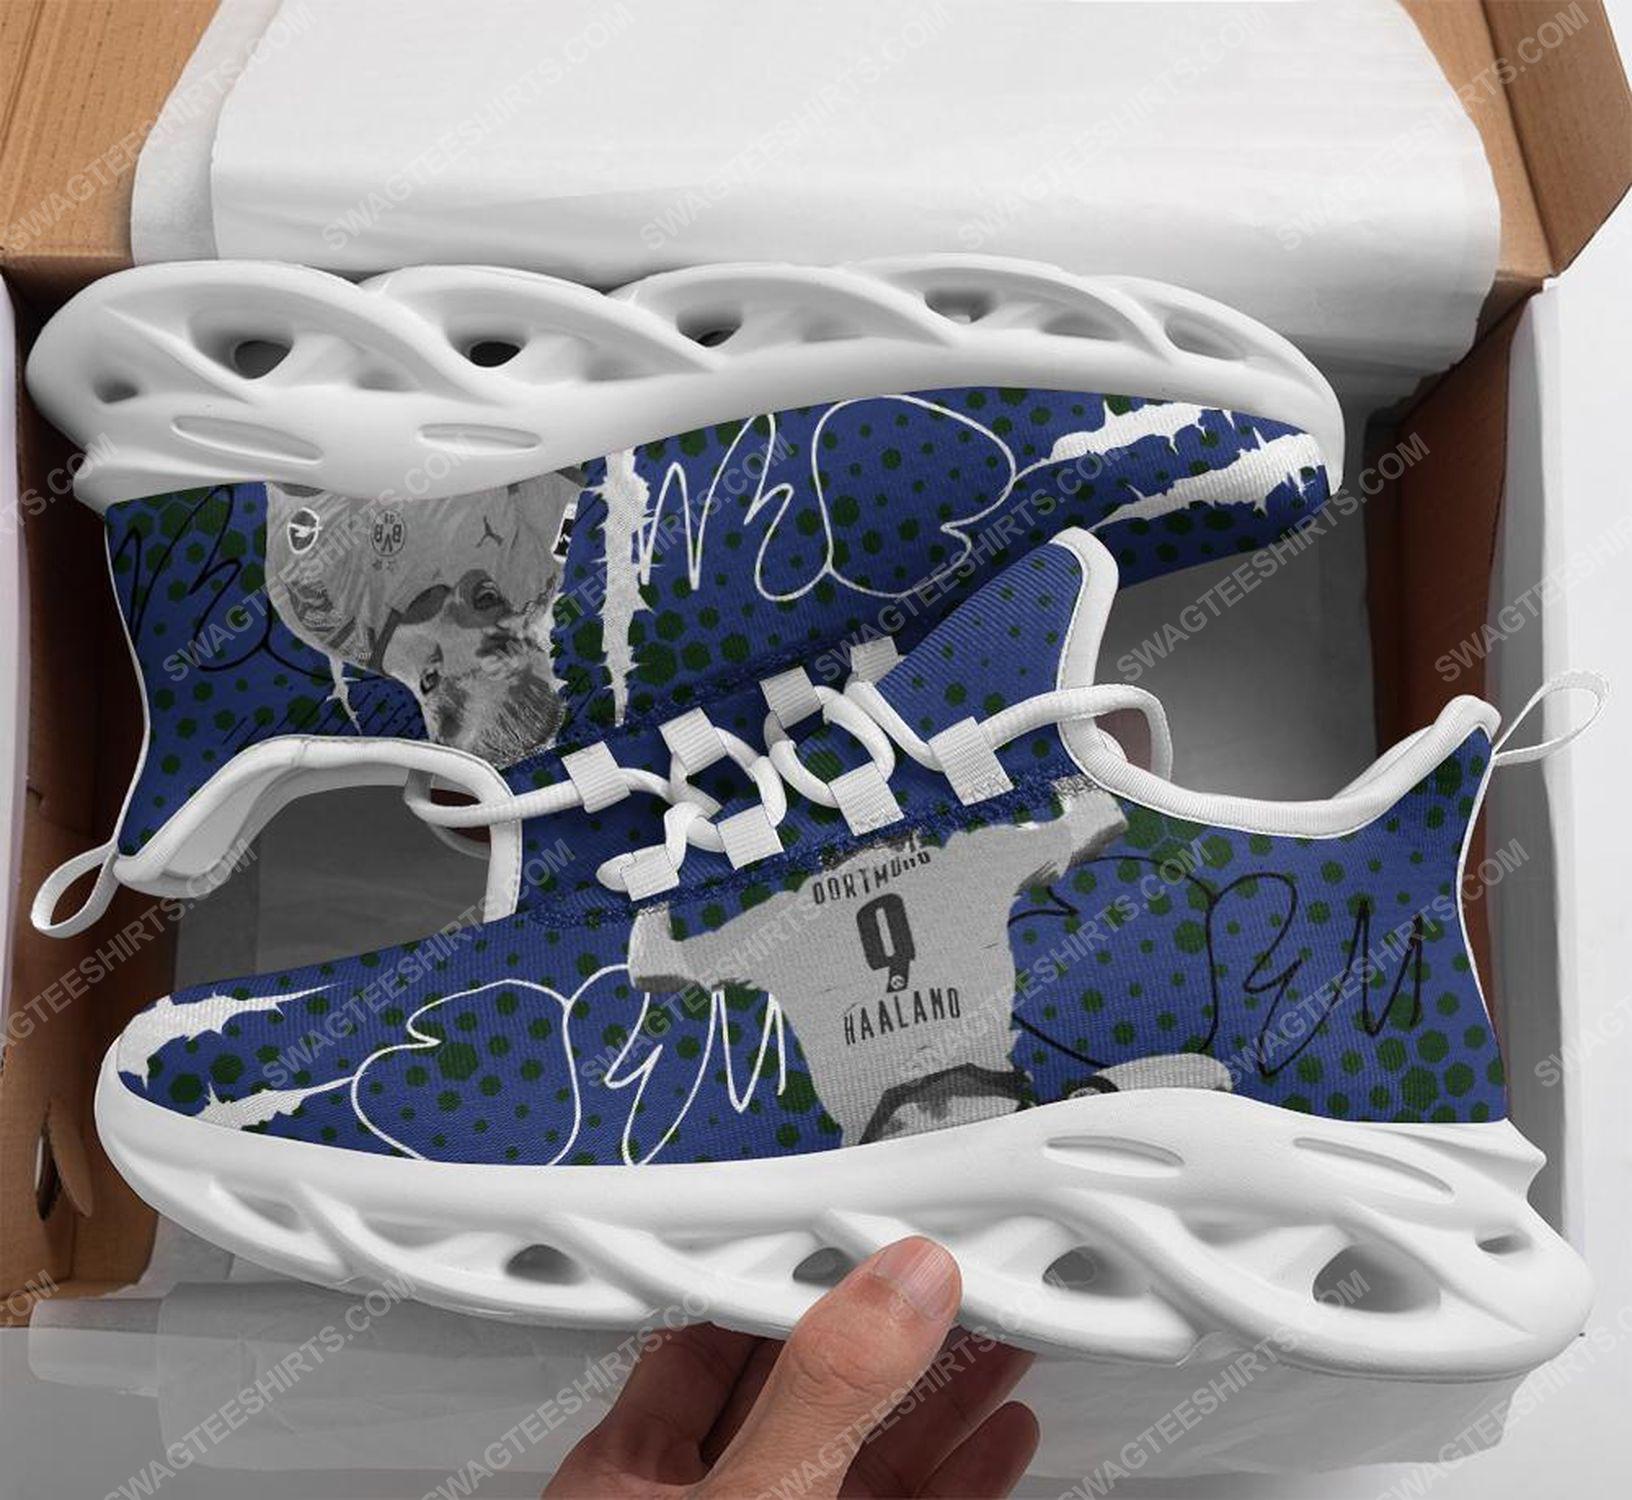 Erling haaland borussia dortmund football club max soul shoes 1